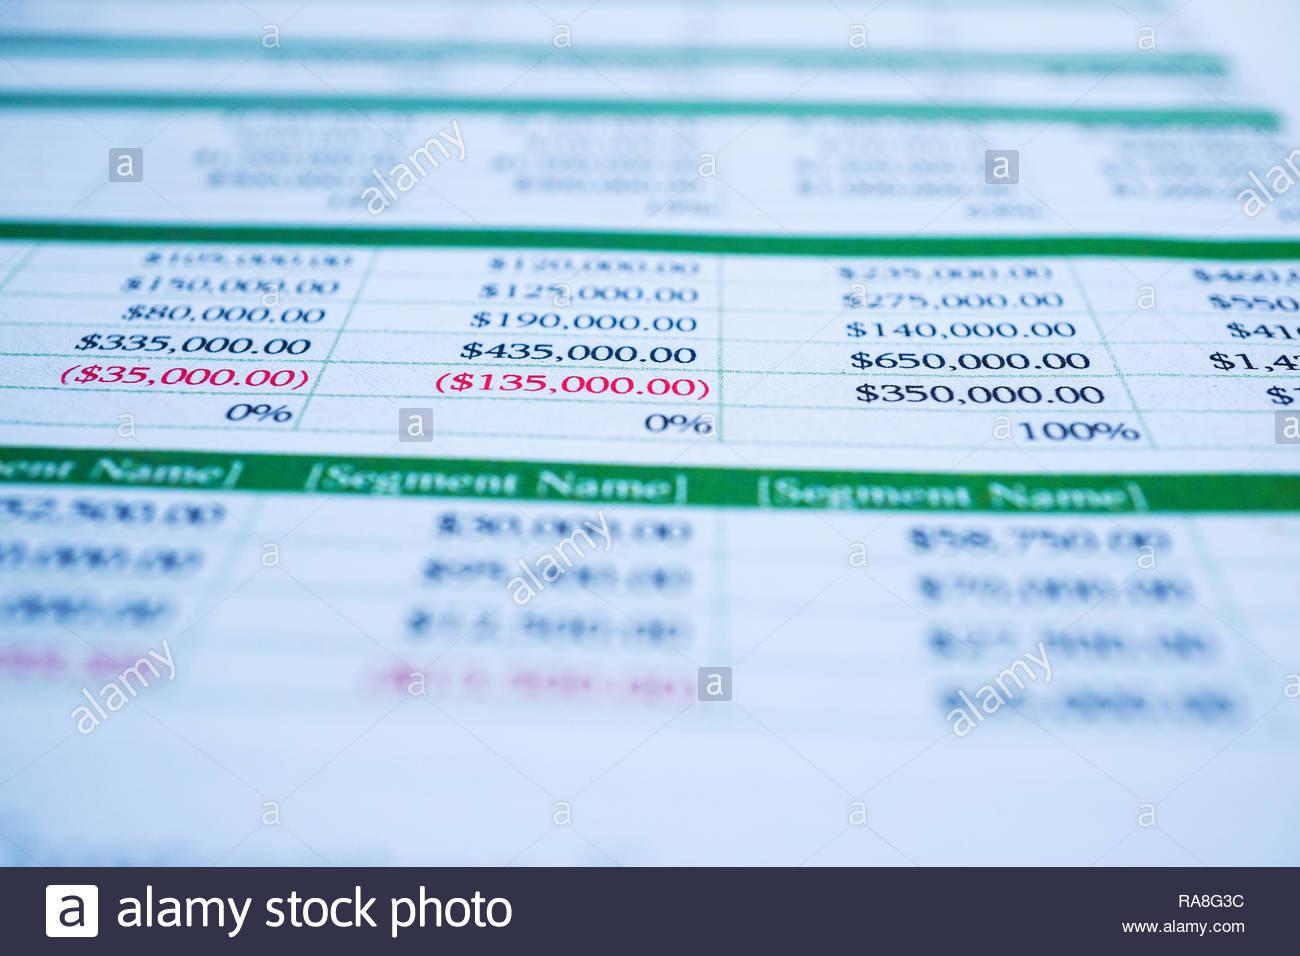 Stock Trading Excel Spreadsheet Regarding Excel Spreadsheet Stock Photos  Excel Spreadsheet Stock Images  Alamy